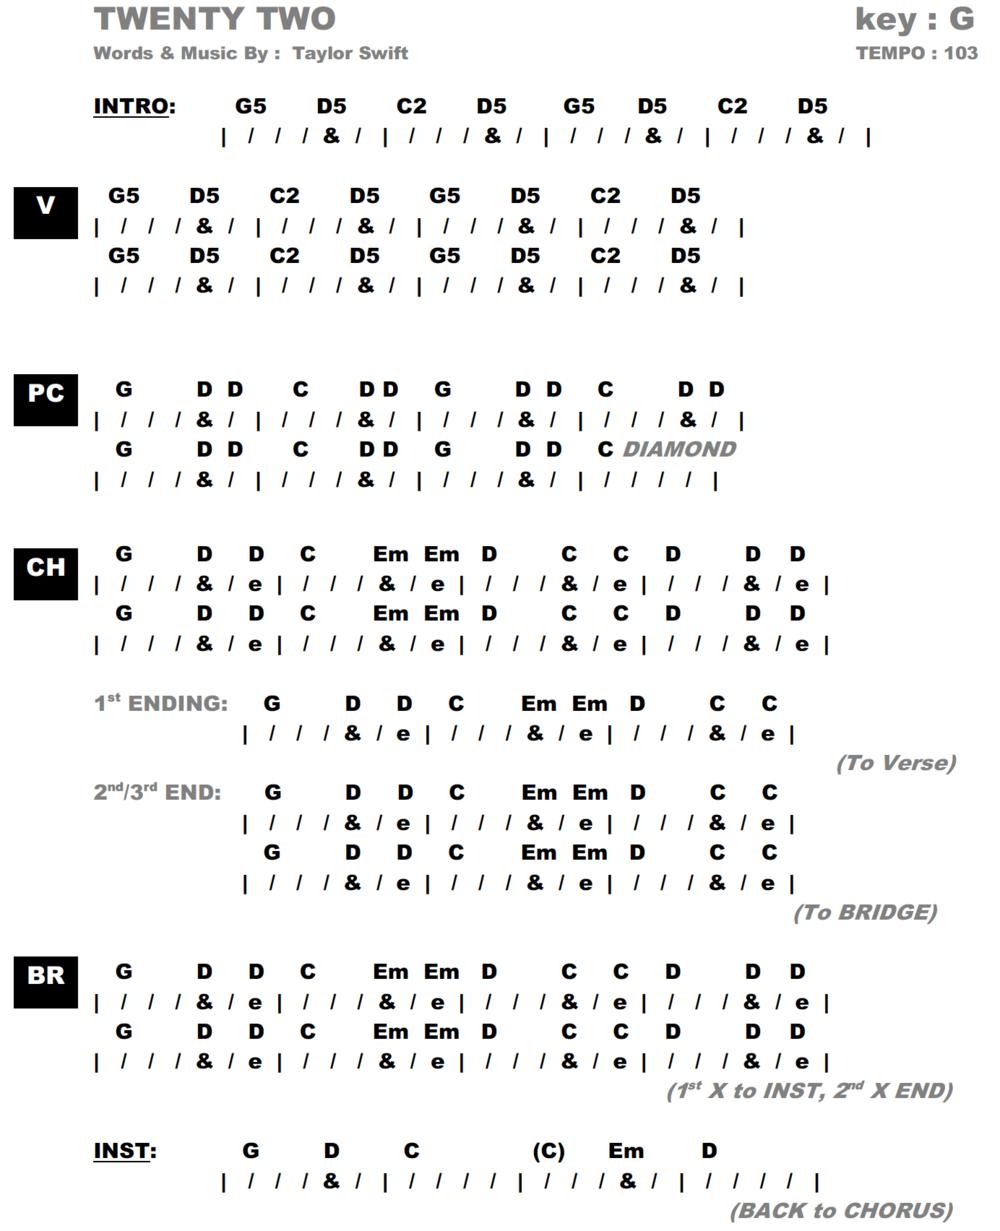 22 - Chords (G).png